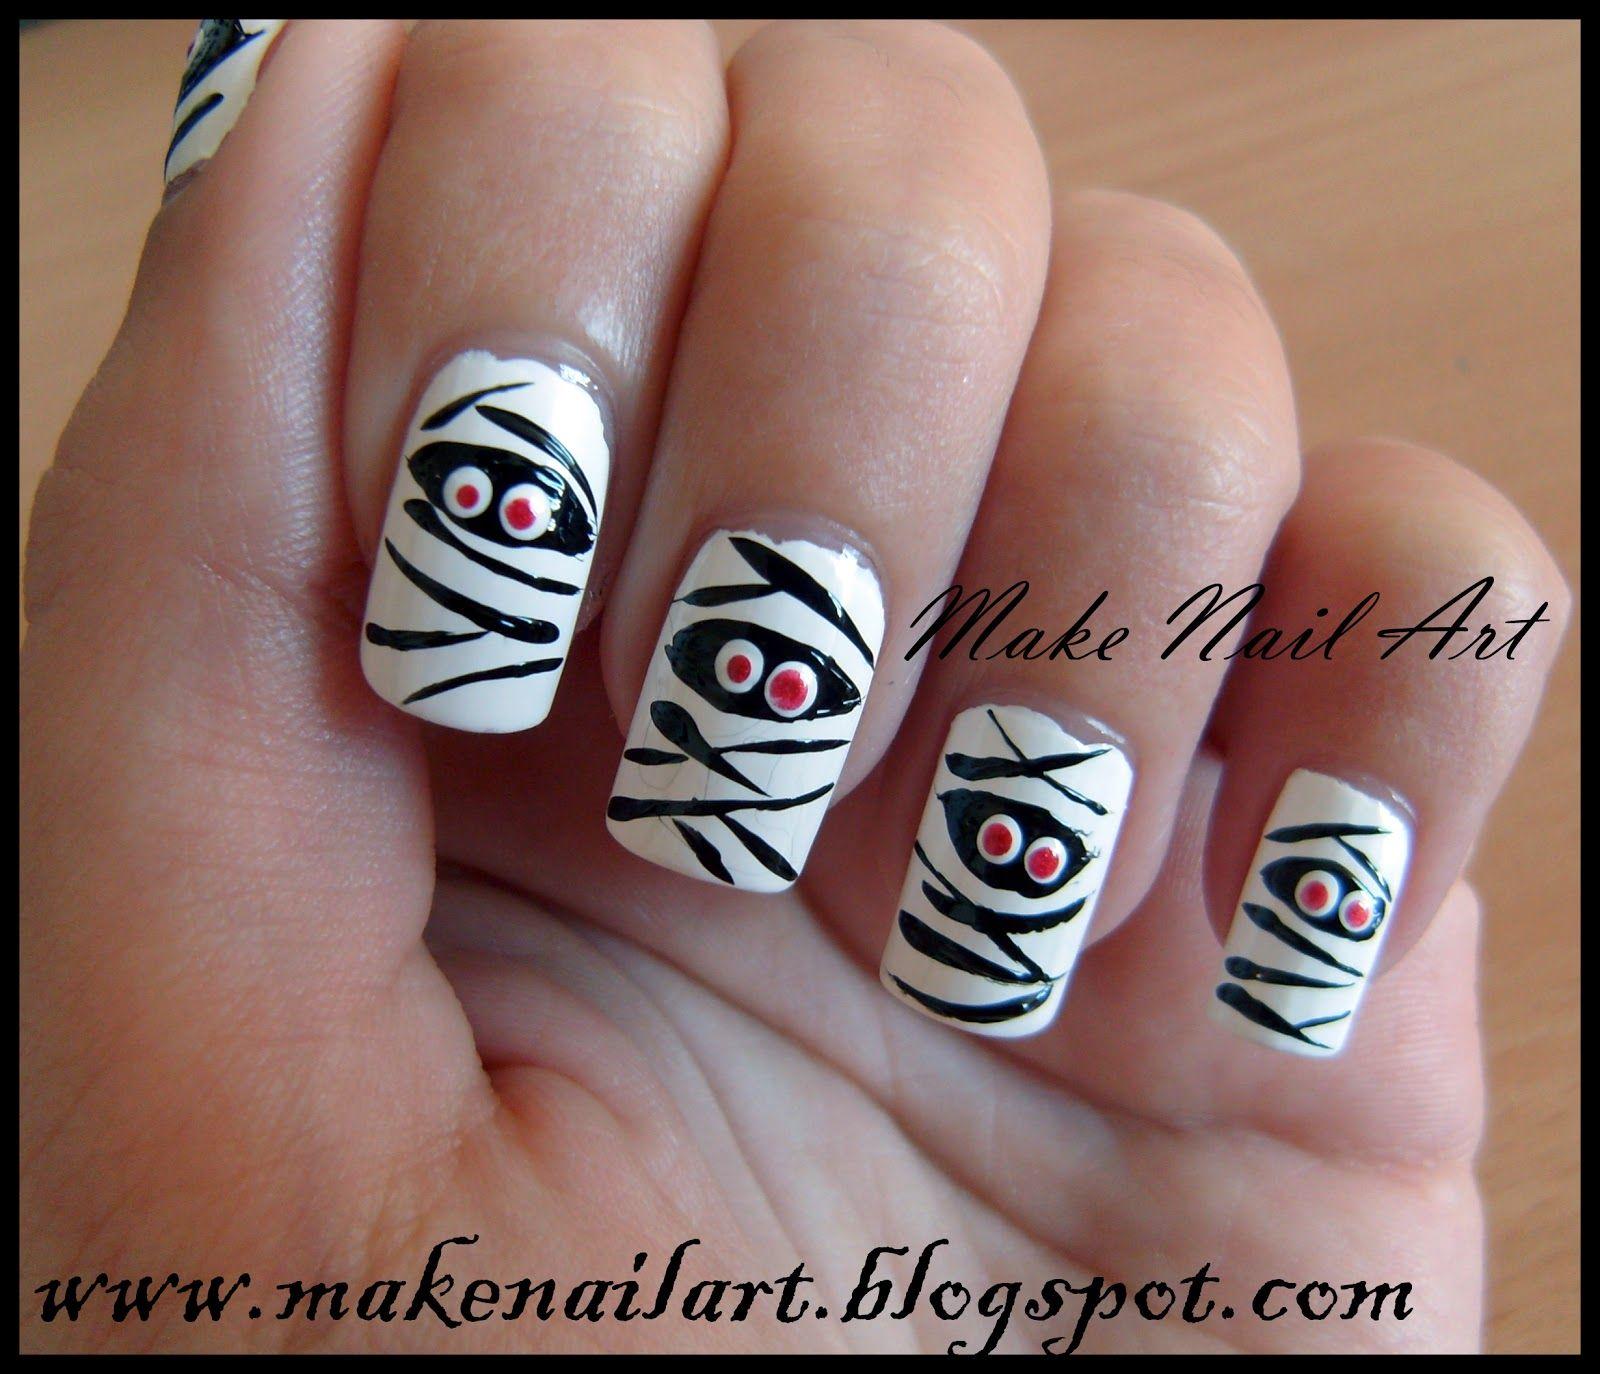 Make Nail Art: Mummy Nail Art Tutorial Great for Halloween time